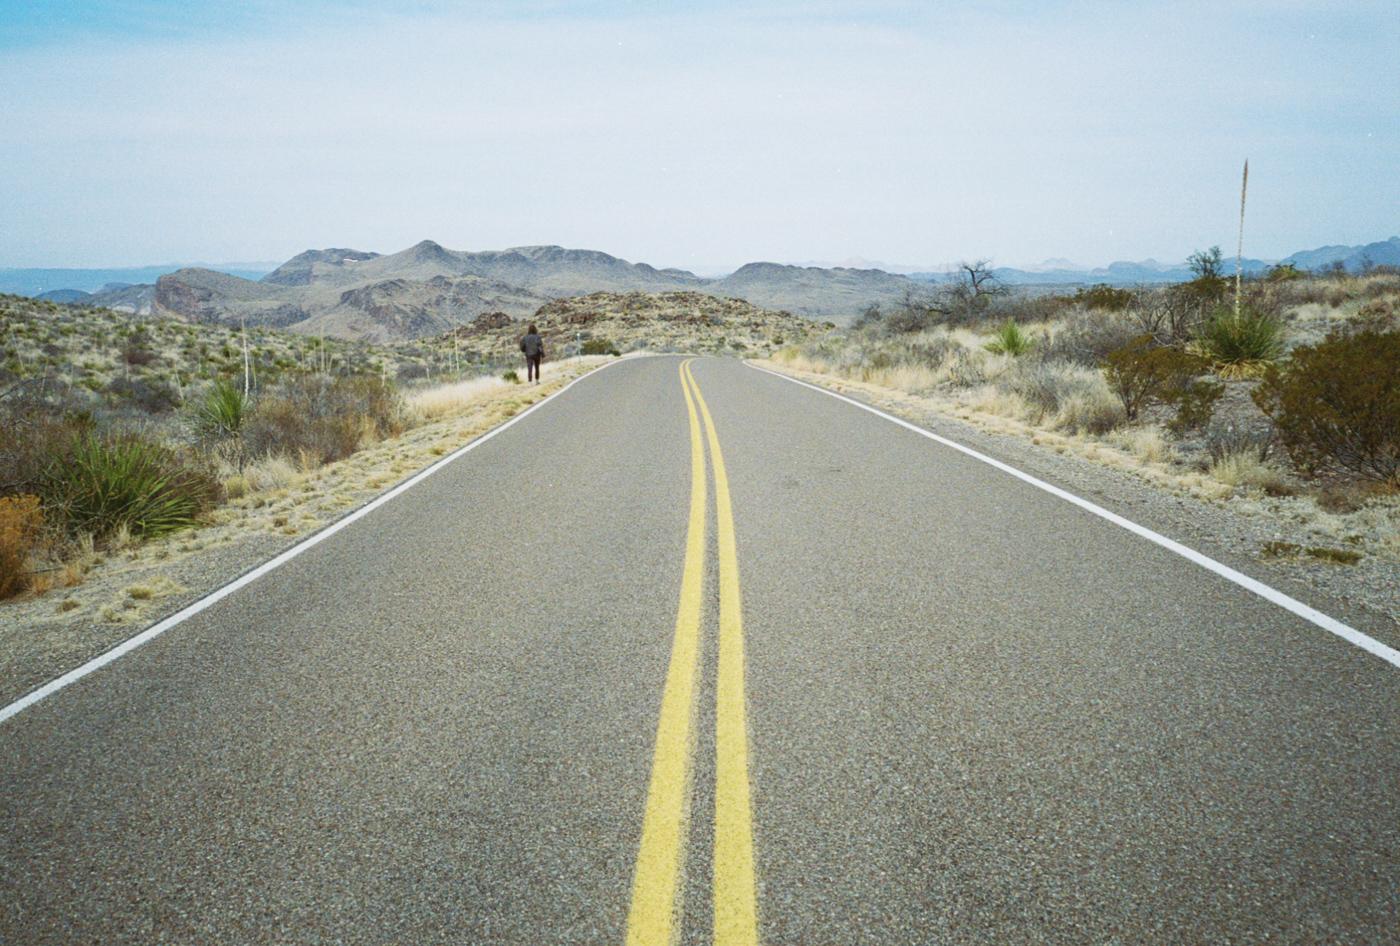 film 35mm lomo olympus hike camp big bend texas america yall pawlowski road